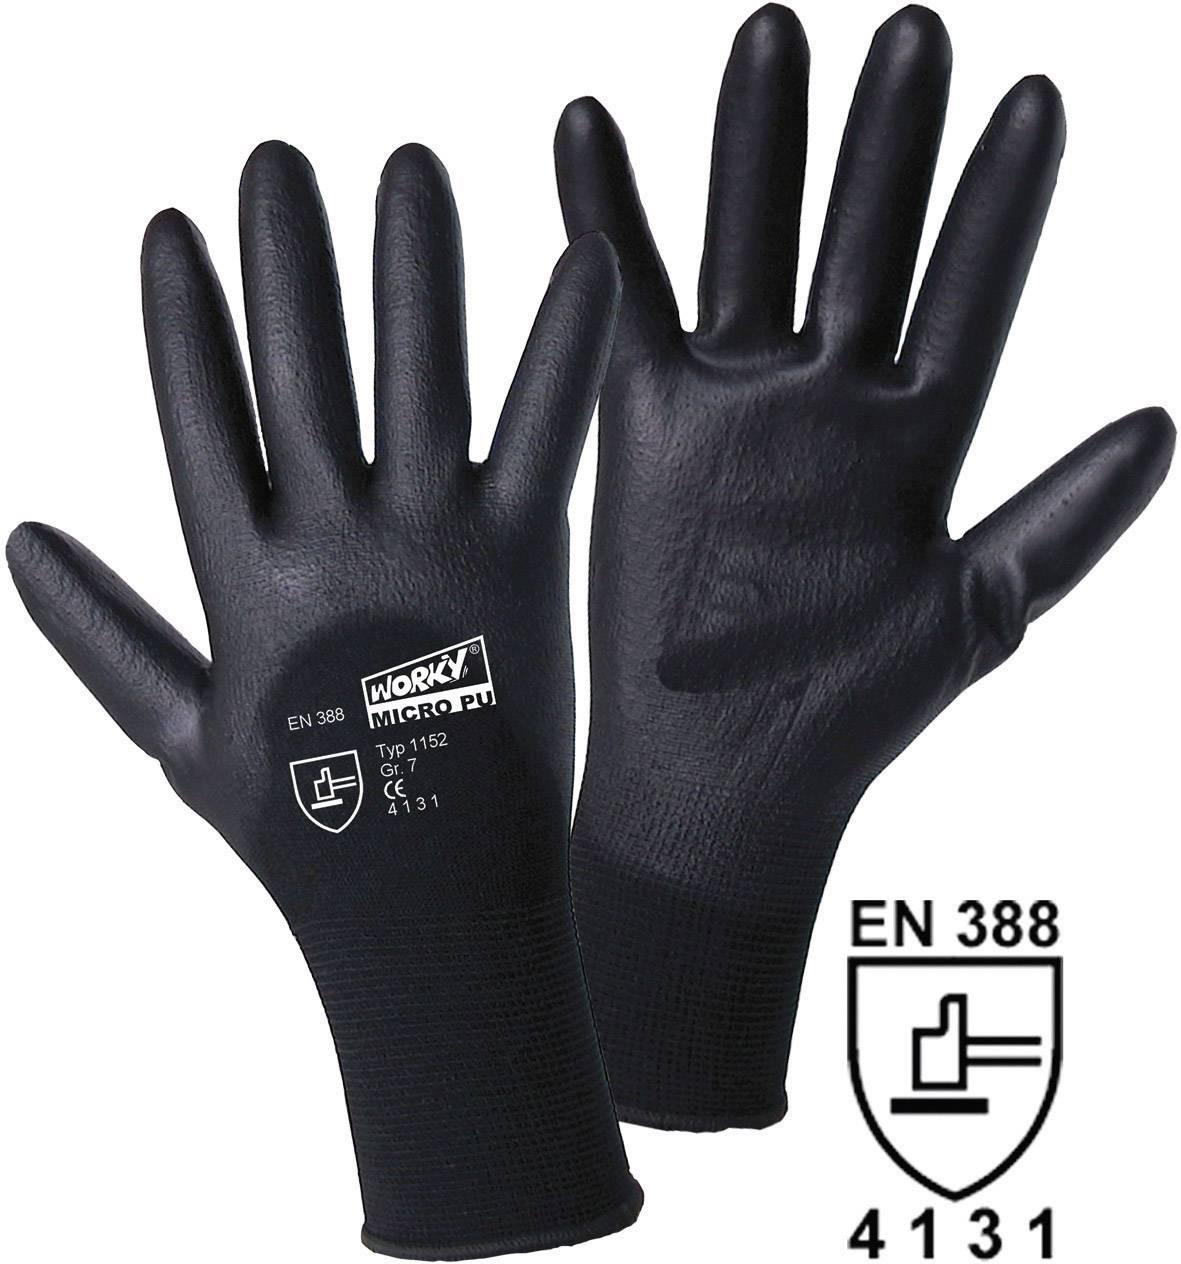 Pracovné rukavice worky MICRO black 1152, velikost rukavic: 7, S